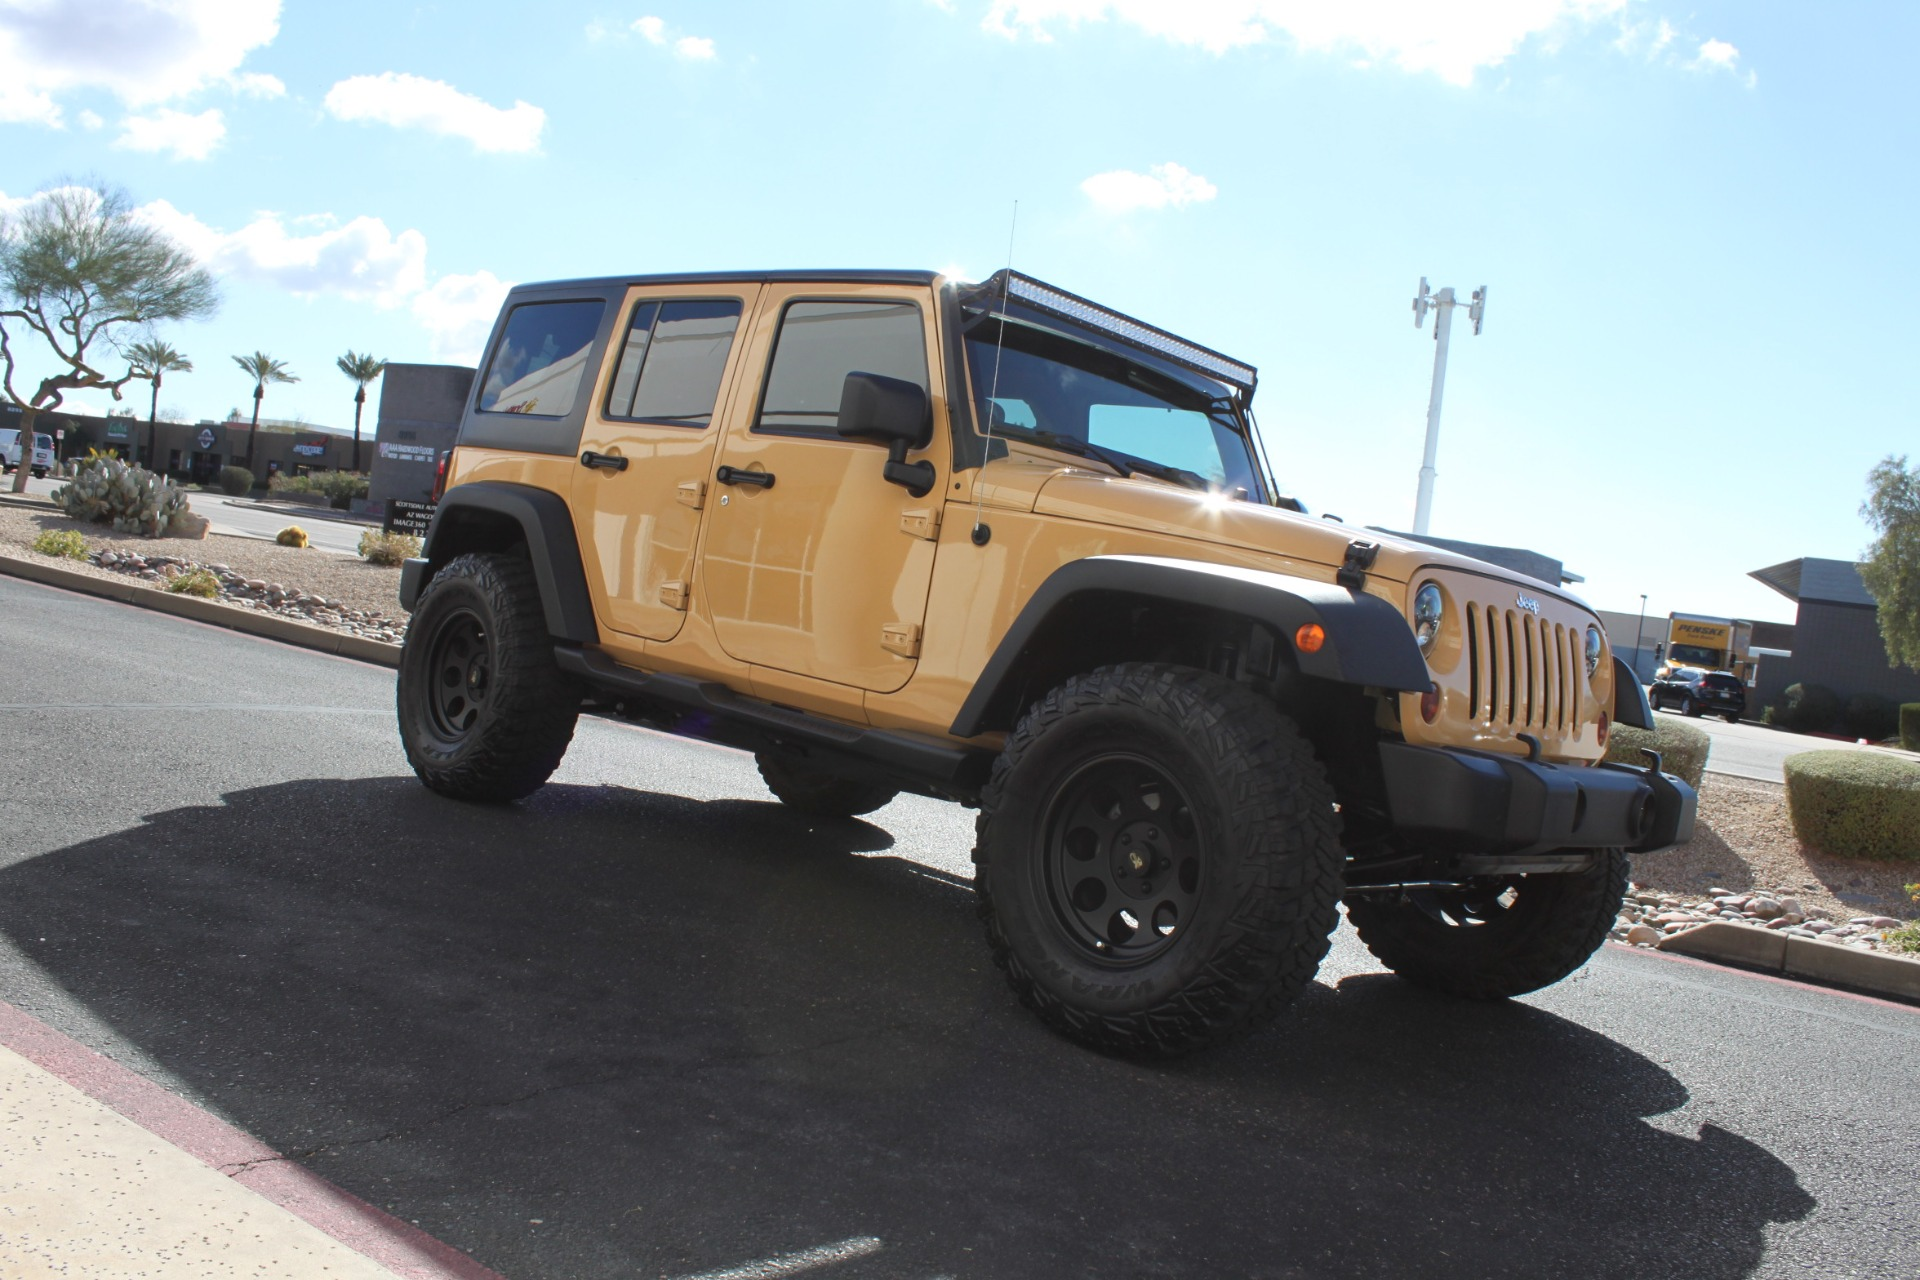 Used-2013-Jeep-Wrangler-Unlimited-Sport-4X4-Fiat